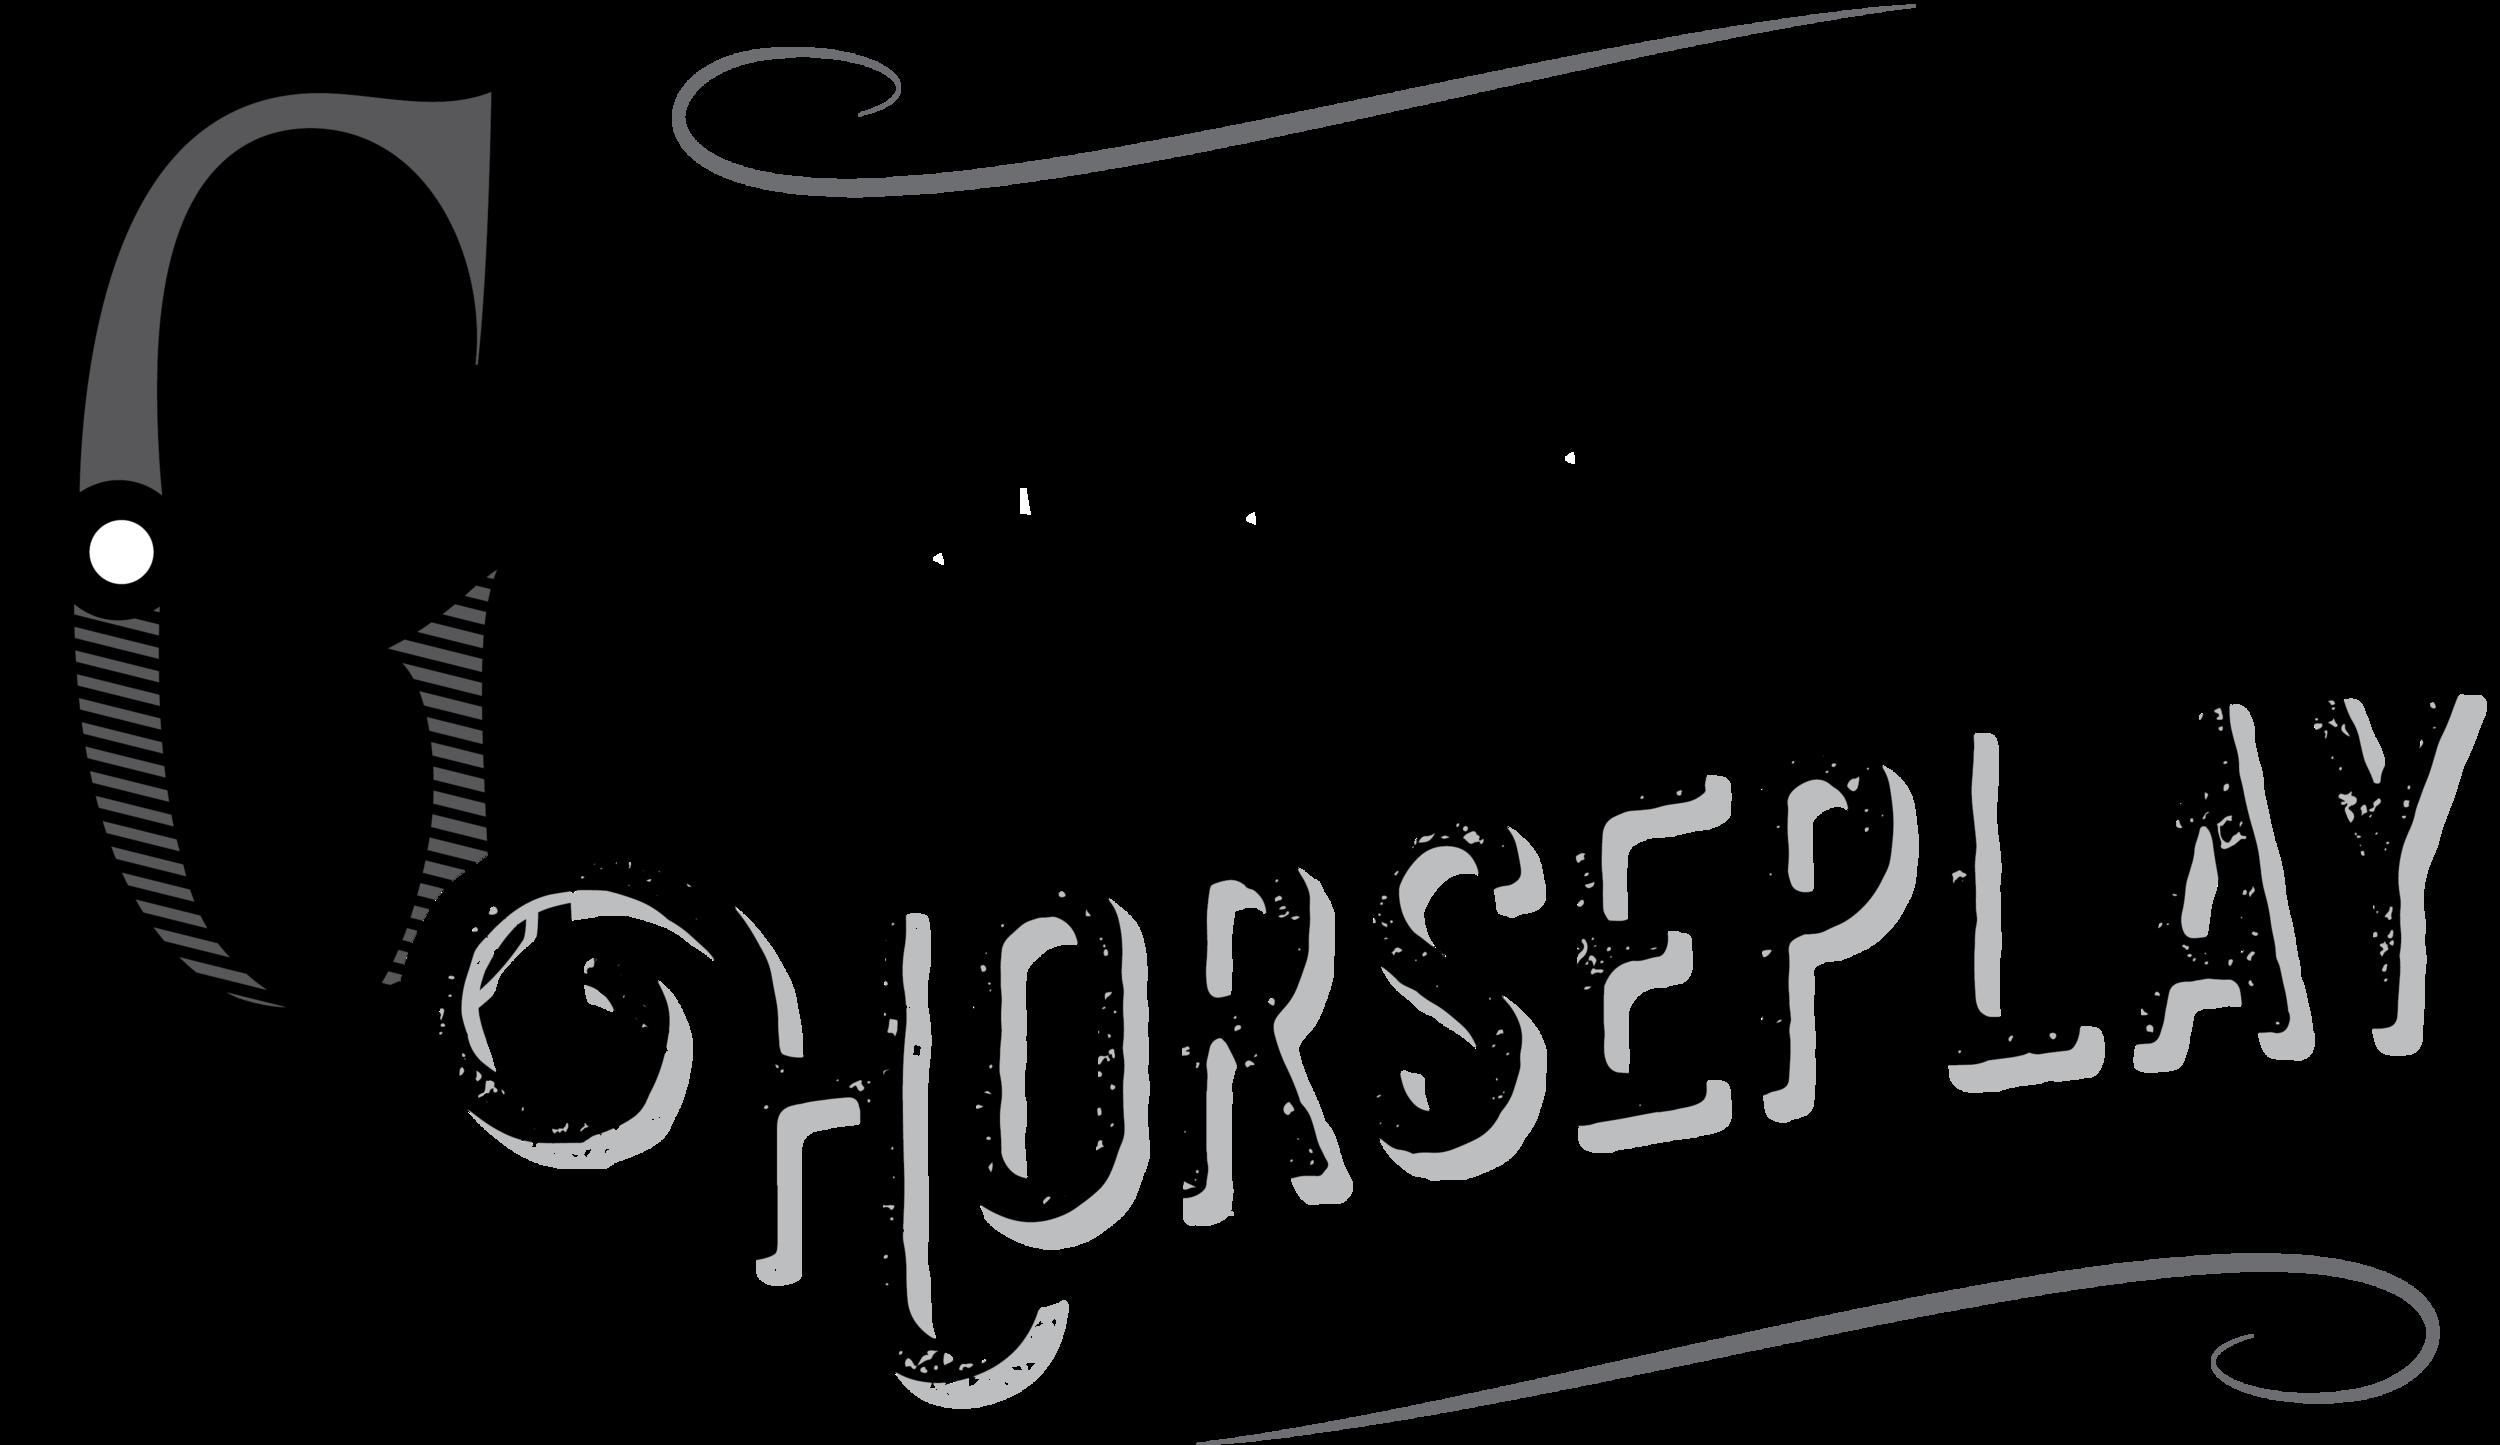 GeneralHorseplay_Logo2.png